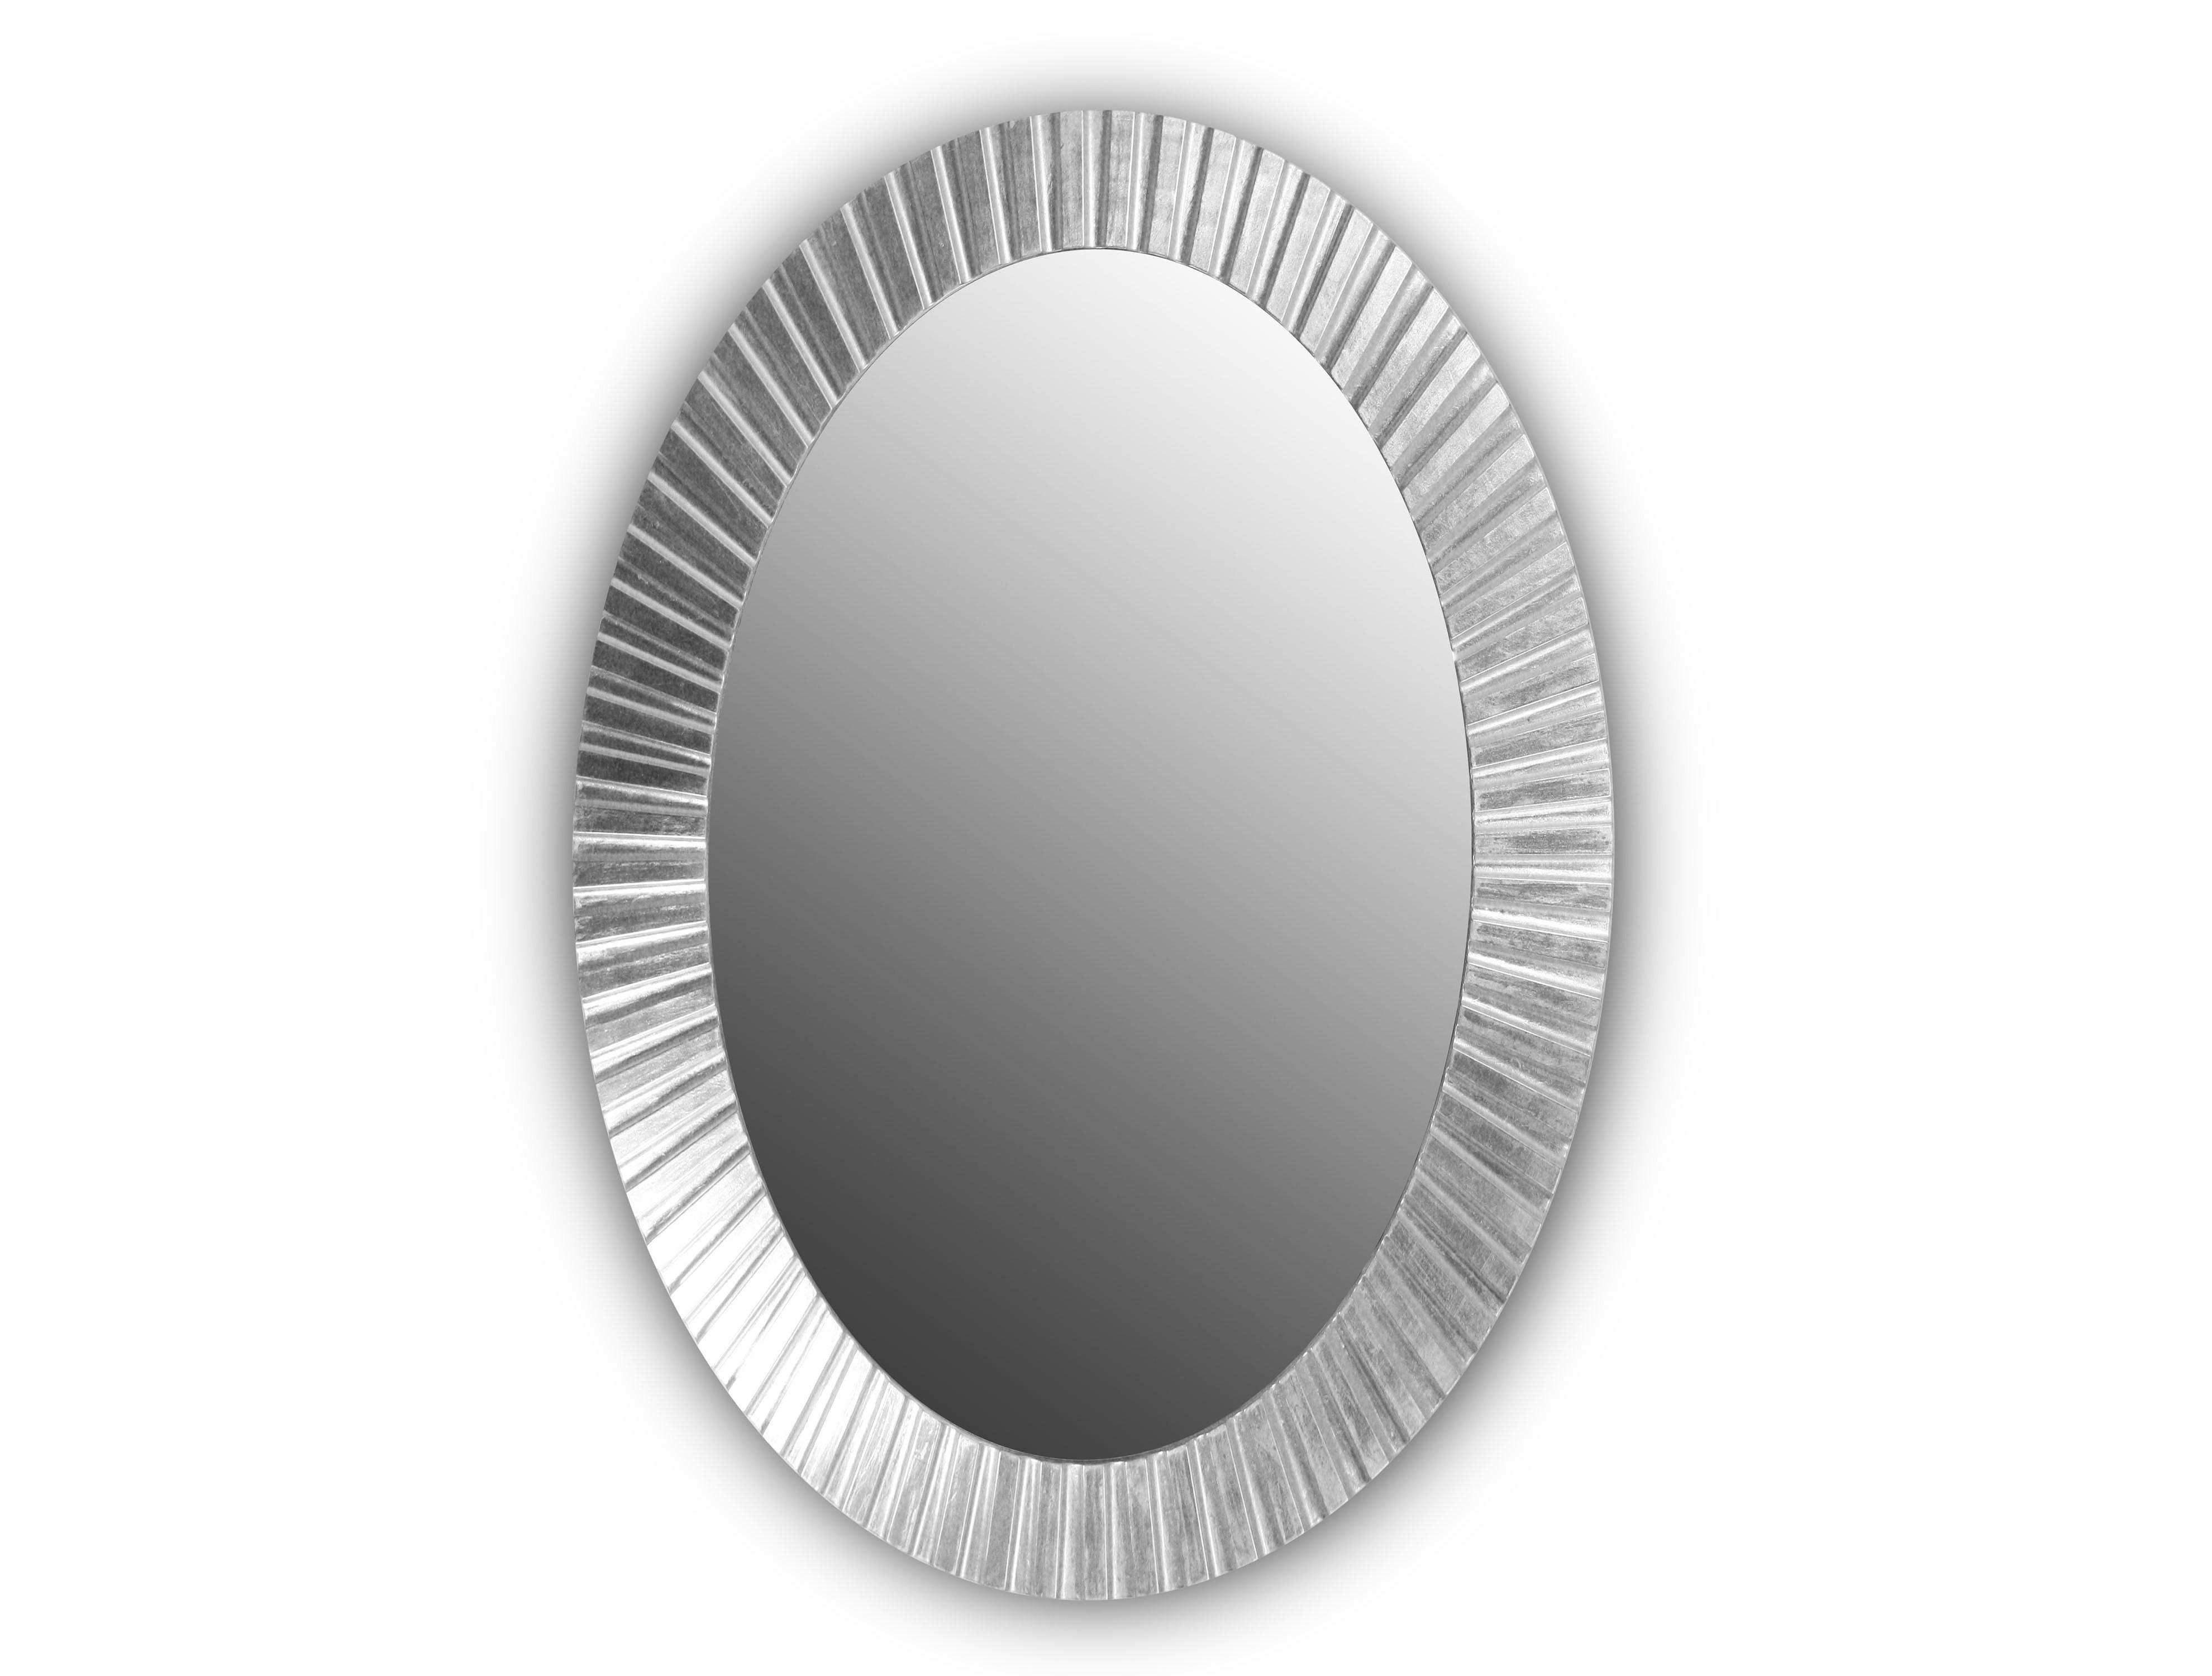 Зеркало Fashion indioНастенные зеркала<br>&amp;amp;nbsp;Патина, поталь<br><br>Material: Дерево<br>Length см: None<br>Width см: 91<br>Depth см: 3<br>Height см: 130